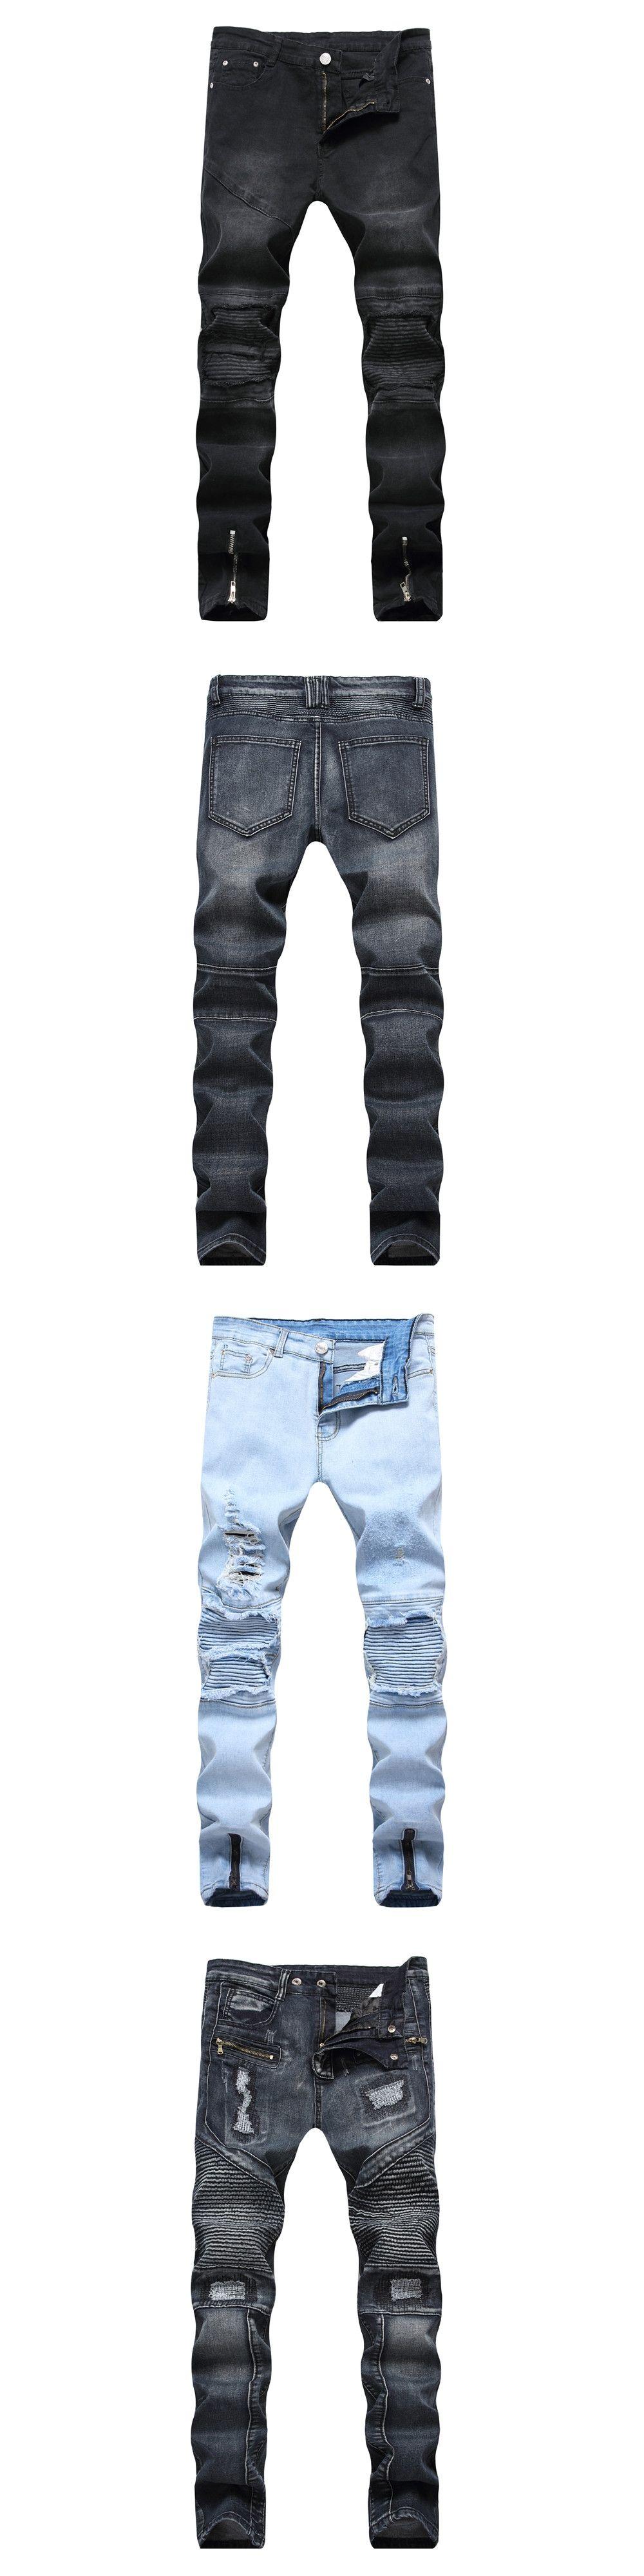 090d1e8483326 Ankle Zipper Design Hi-Street Mens Black Ripped Jeans Men Fashion Male  Distressed Skinny Jeans Destroyed Denim Jeans Trousers